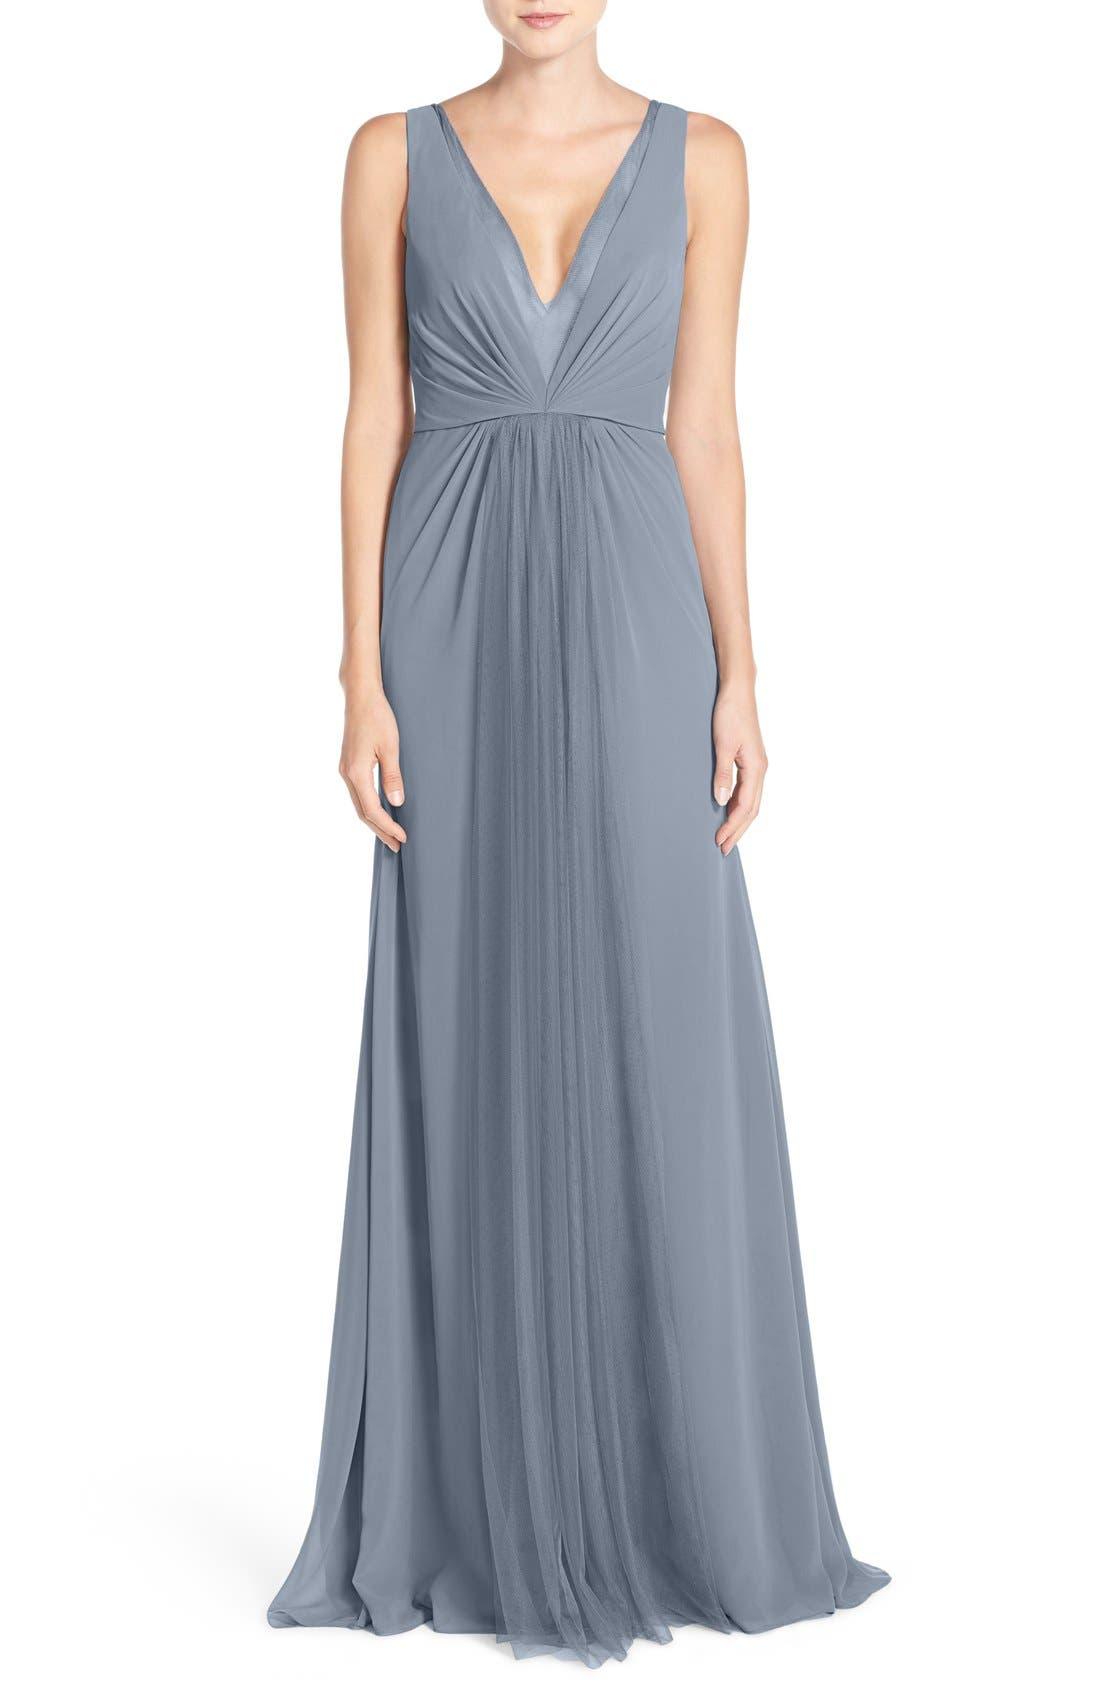 Alternate Image 1 Selected - Monique Lhuillier Bridesmaids Deep V-Neck Chiffon & Tulle Gown